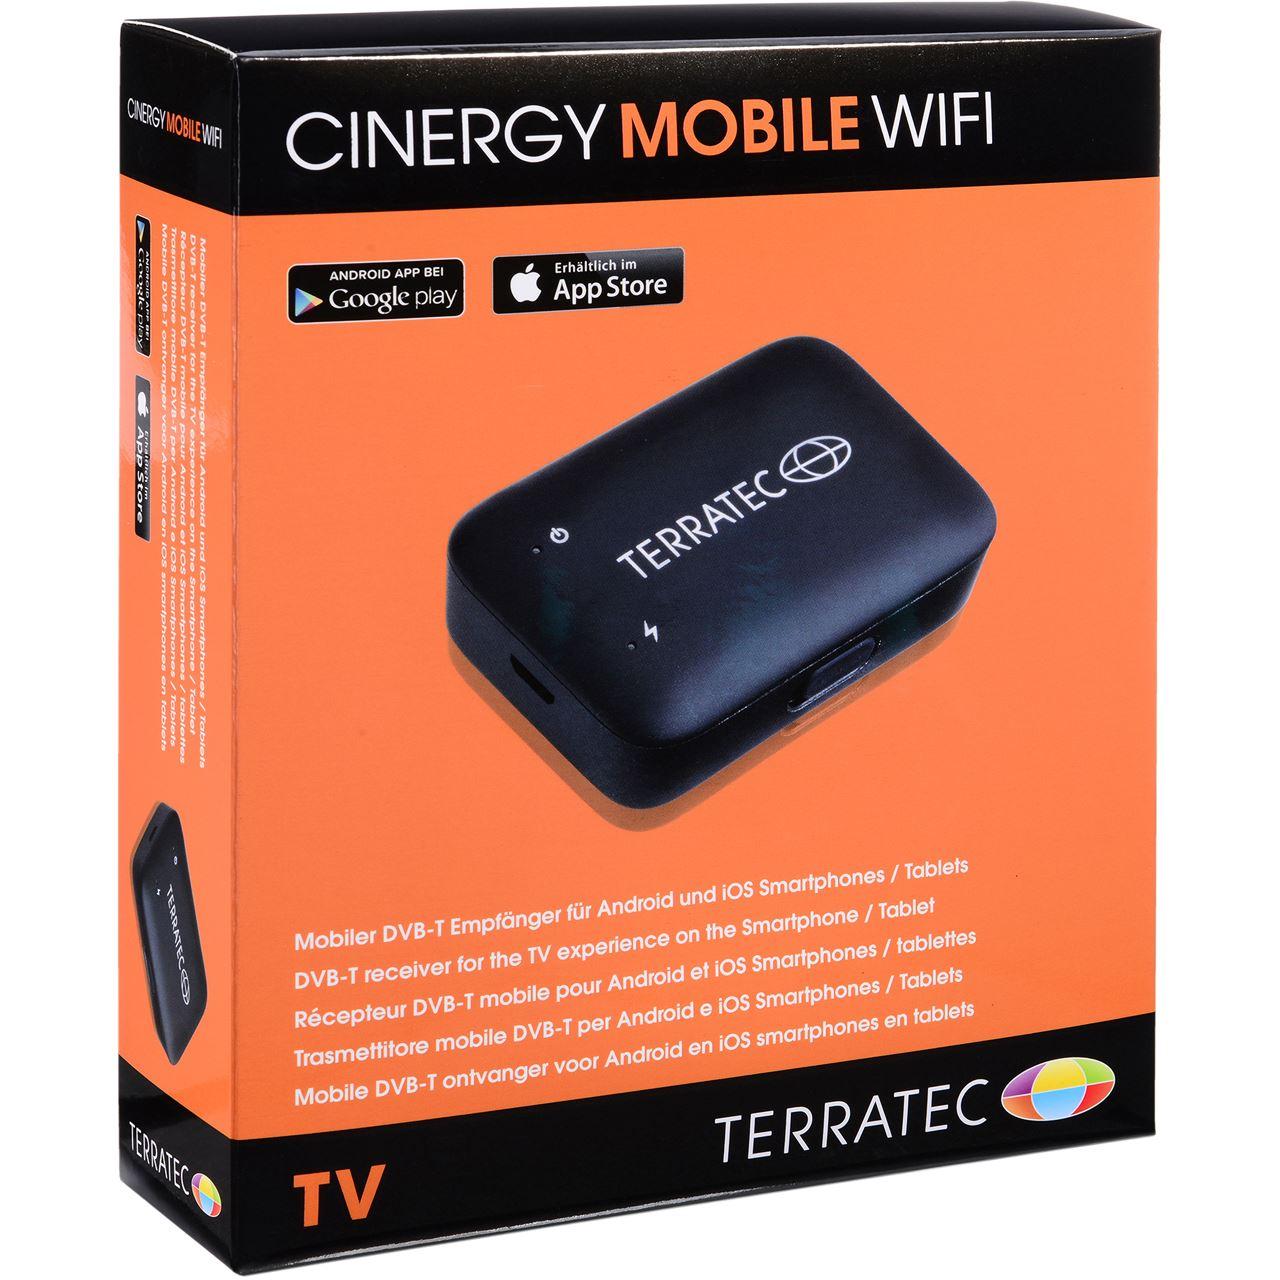 terratec cinergy mobile wifi wifi dvb t box receiver f r dvb t tv hardware. Black Bedroom Furniture Sets. Home Design Ideas